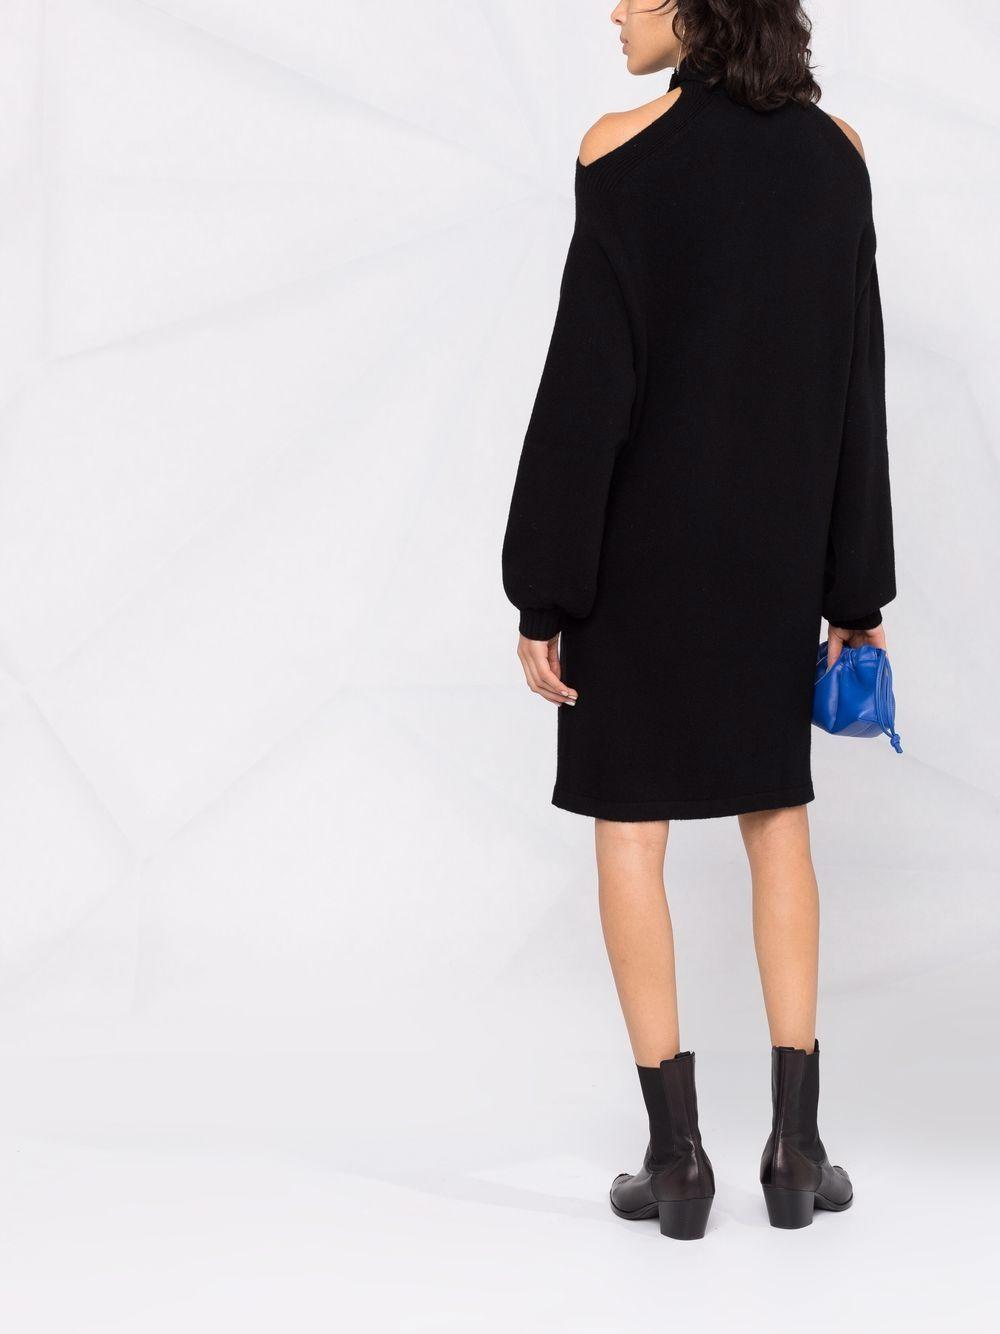 FEDERICA TOSI | Dress | FTI21AK059.0FTAI210002